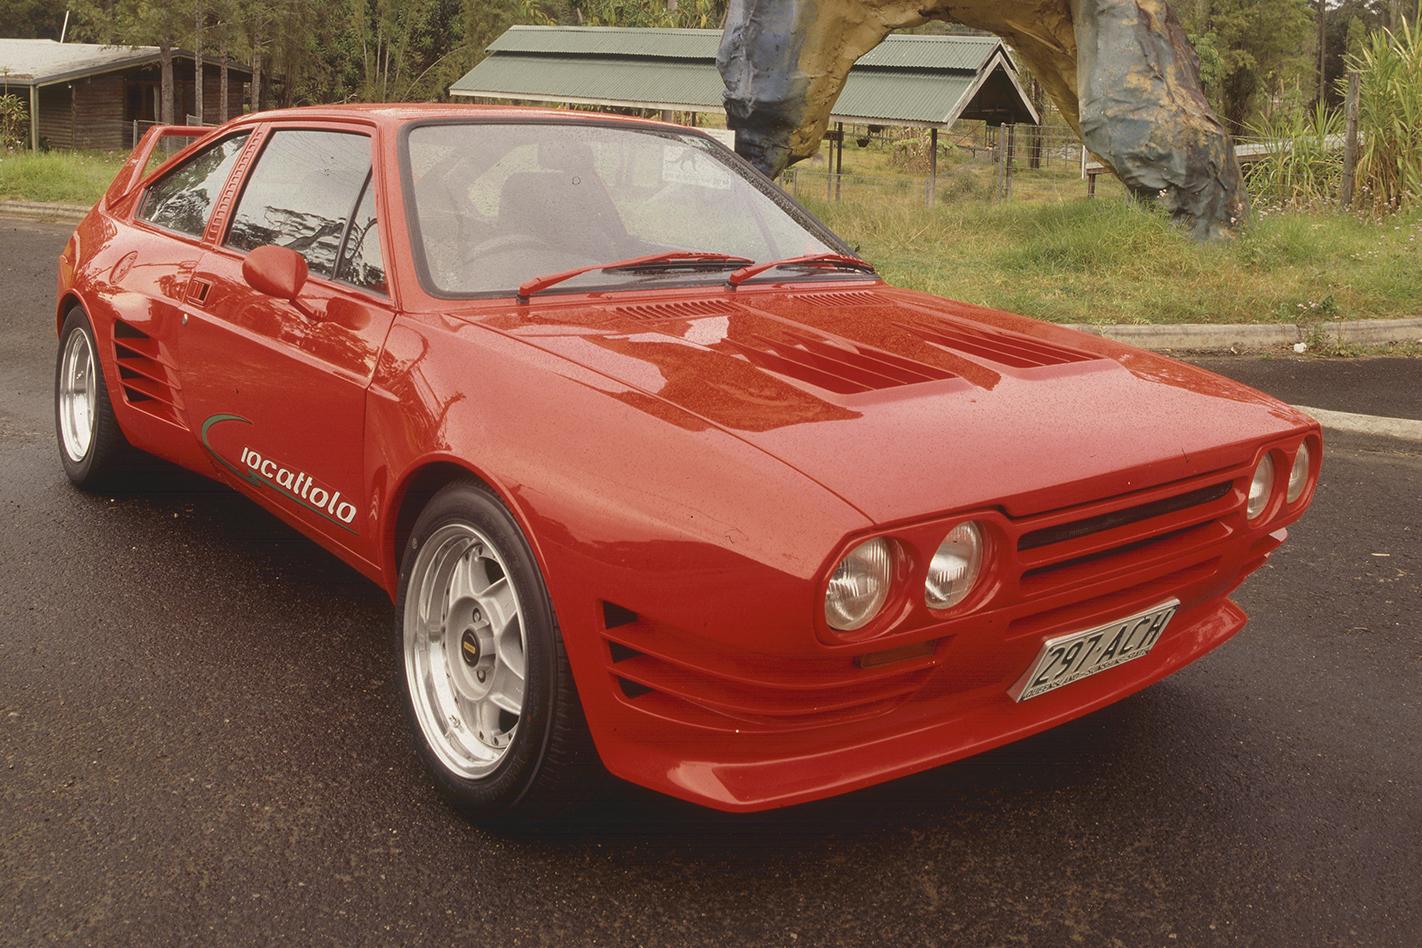 Australia's Own Italian Supercar - 1986 Giocattolo Group B — Carmrades